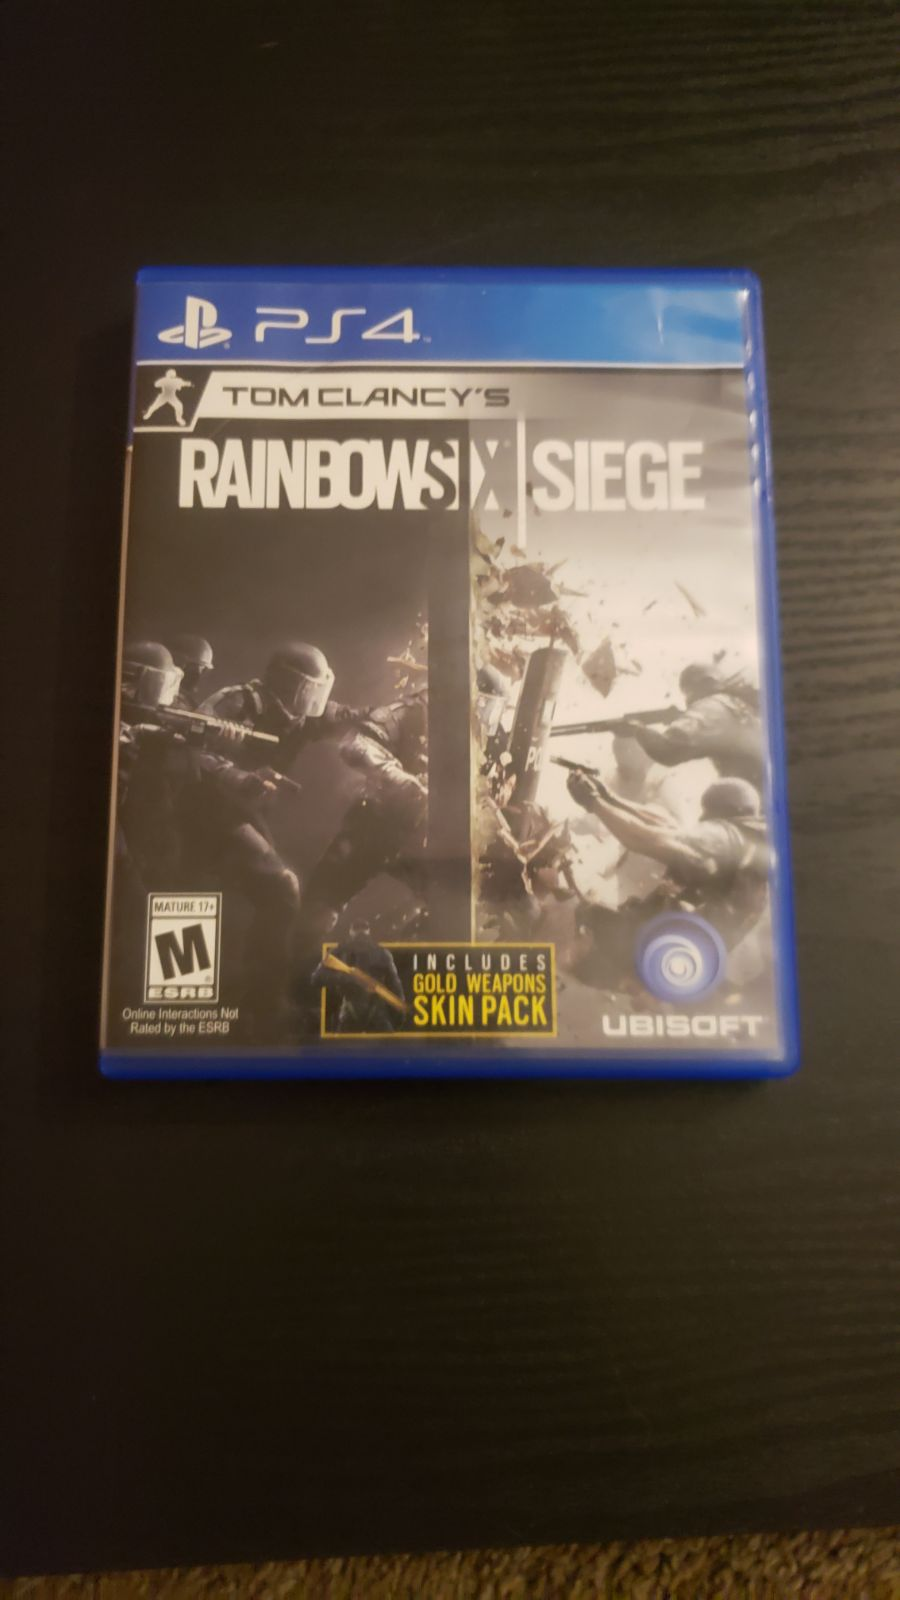 Rainbow Six Siege Playstation 4 PS4